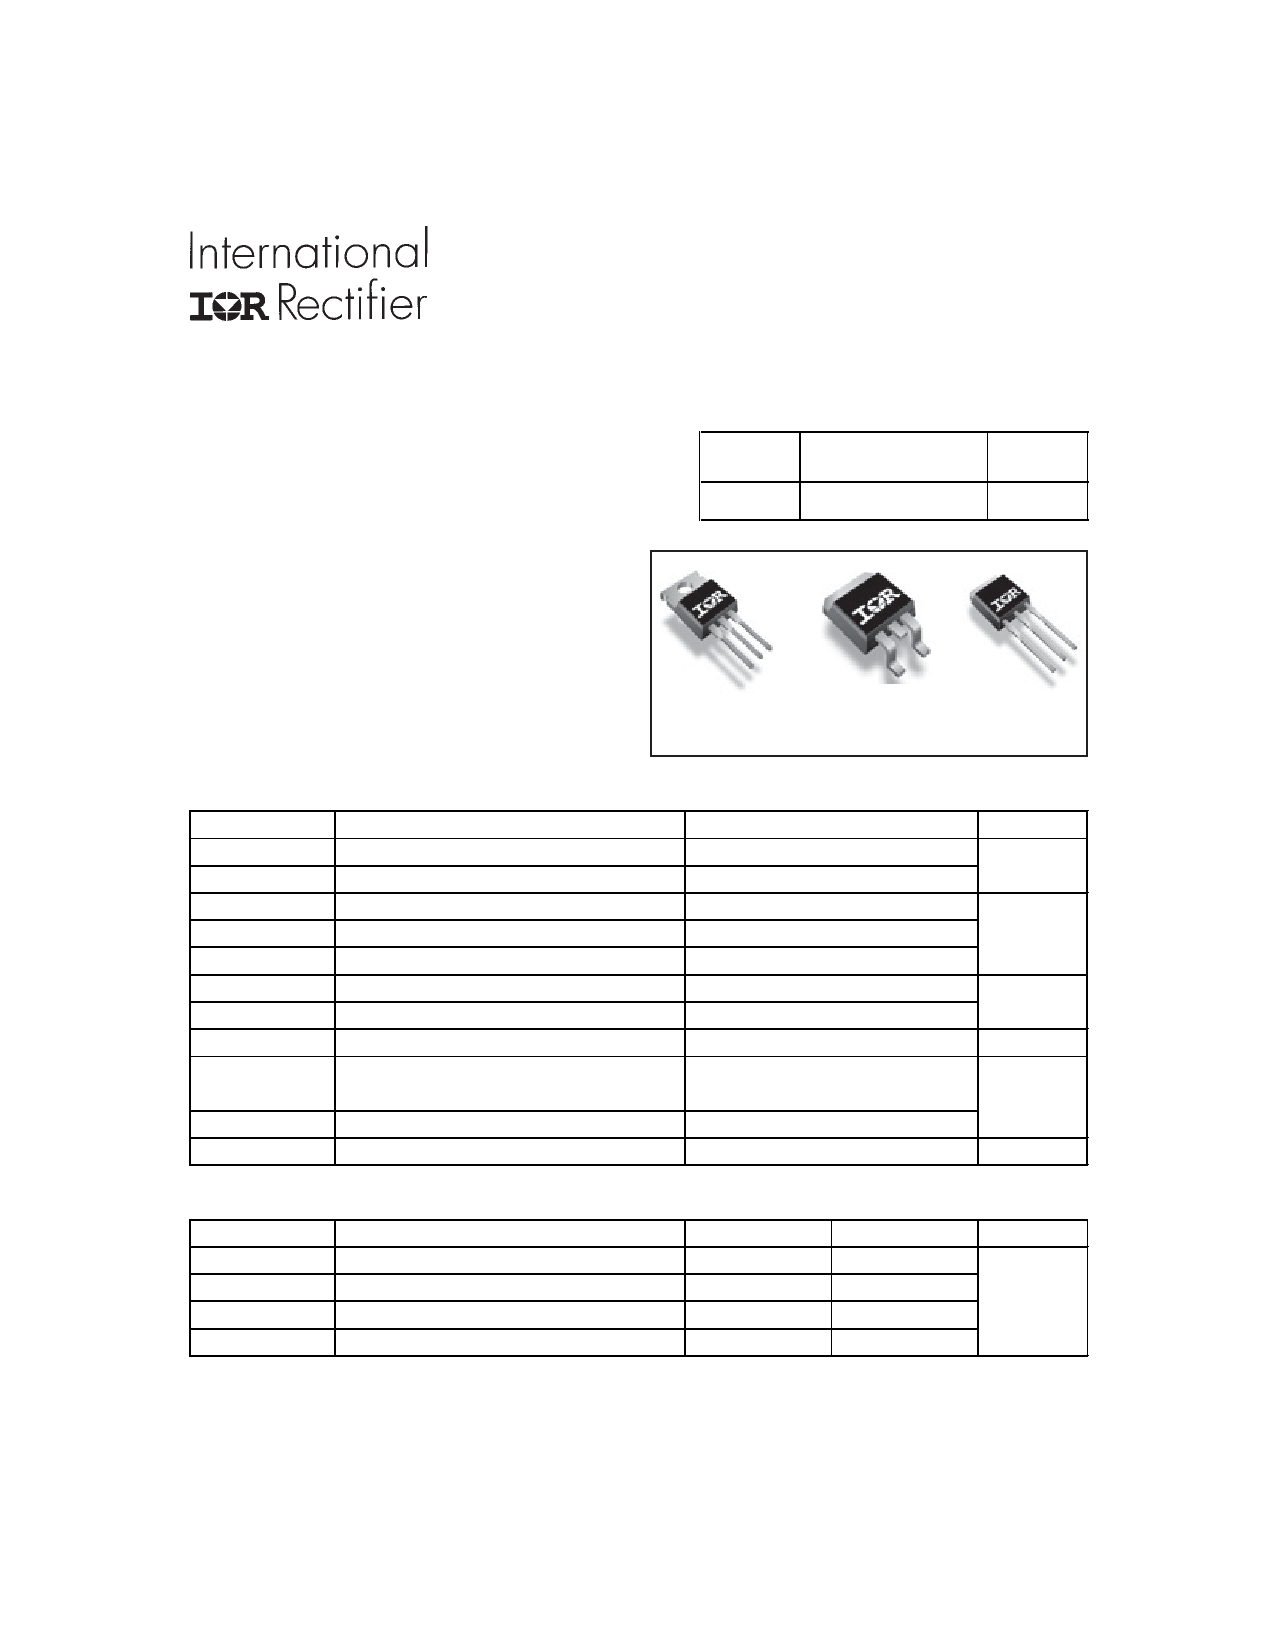 IRF3711ZLPbF Datasheet, IRF3711ZLPbF PDF,ピン配置, 機能